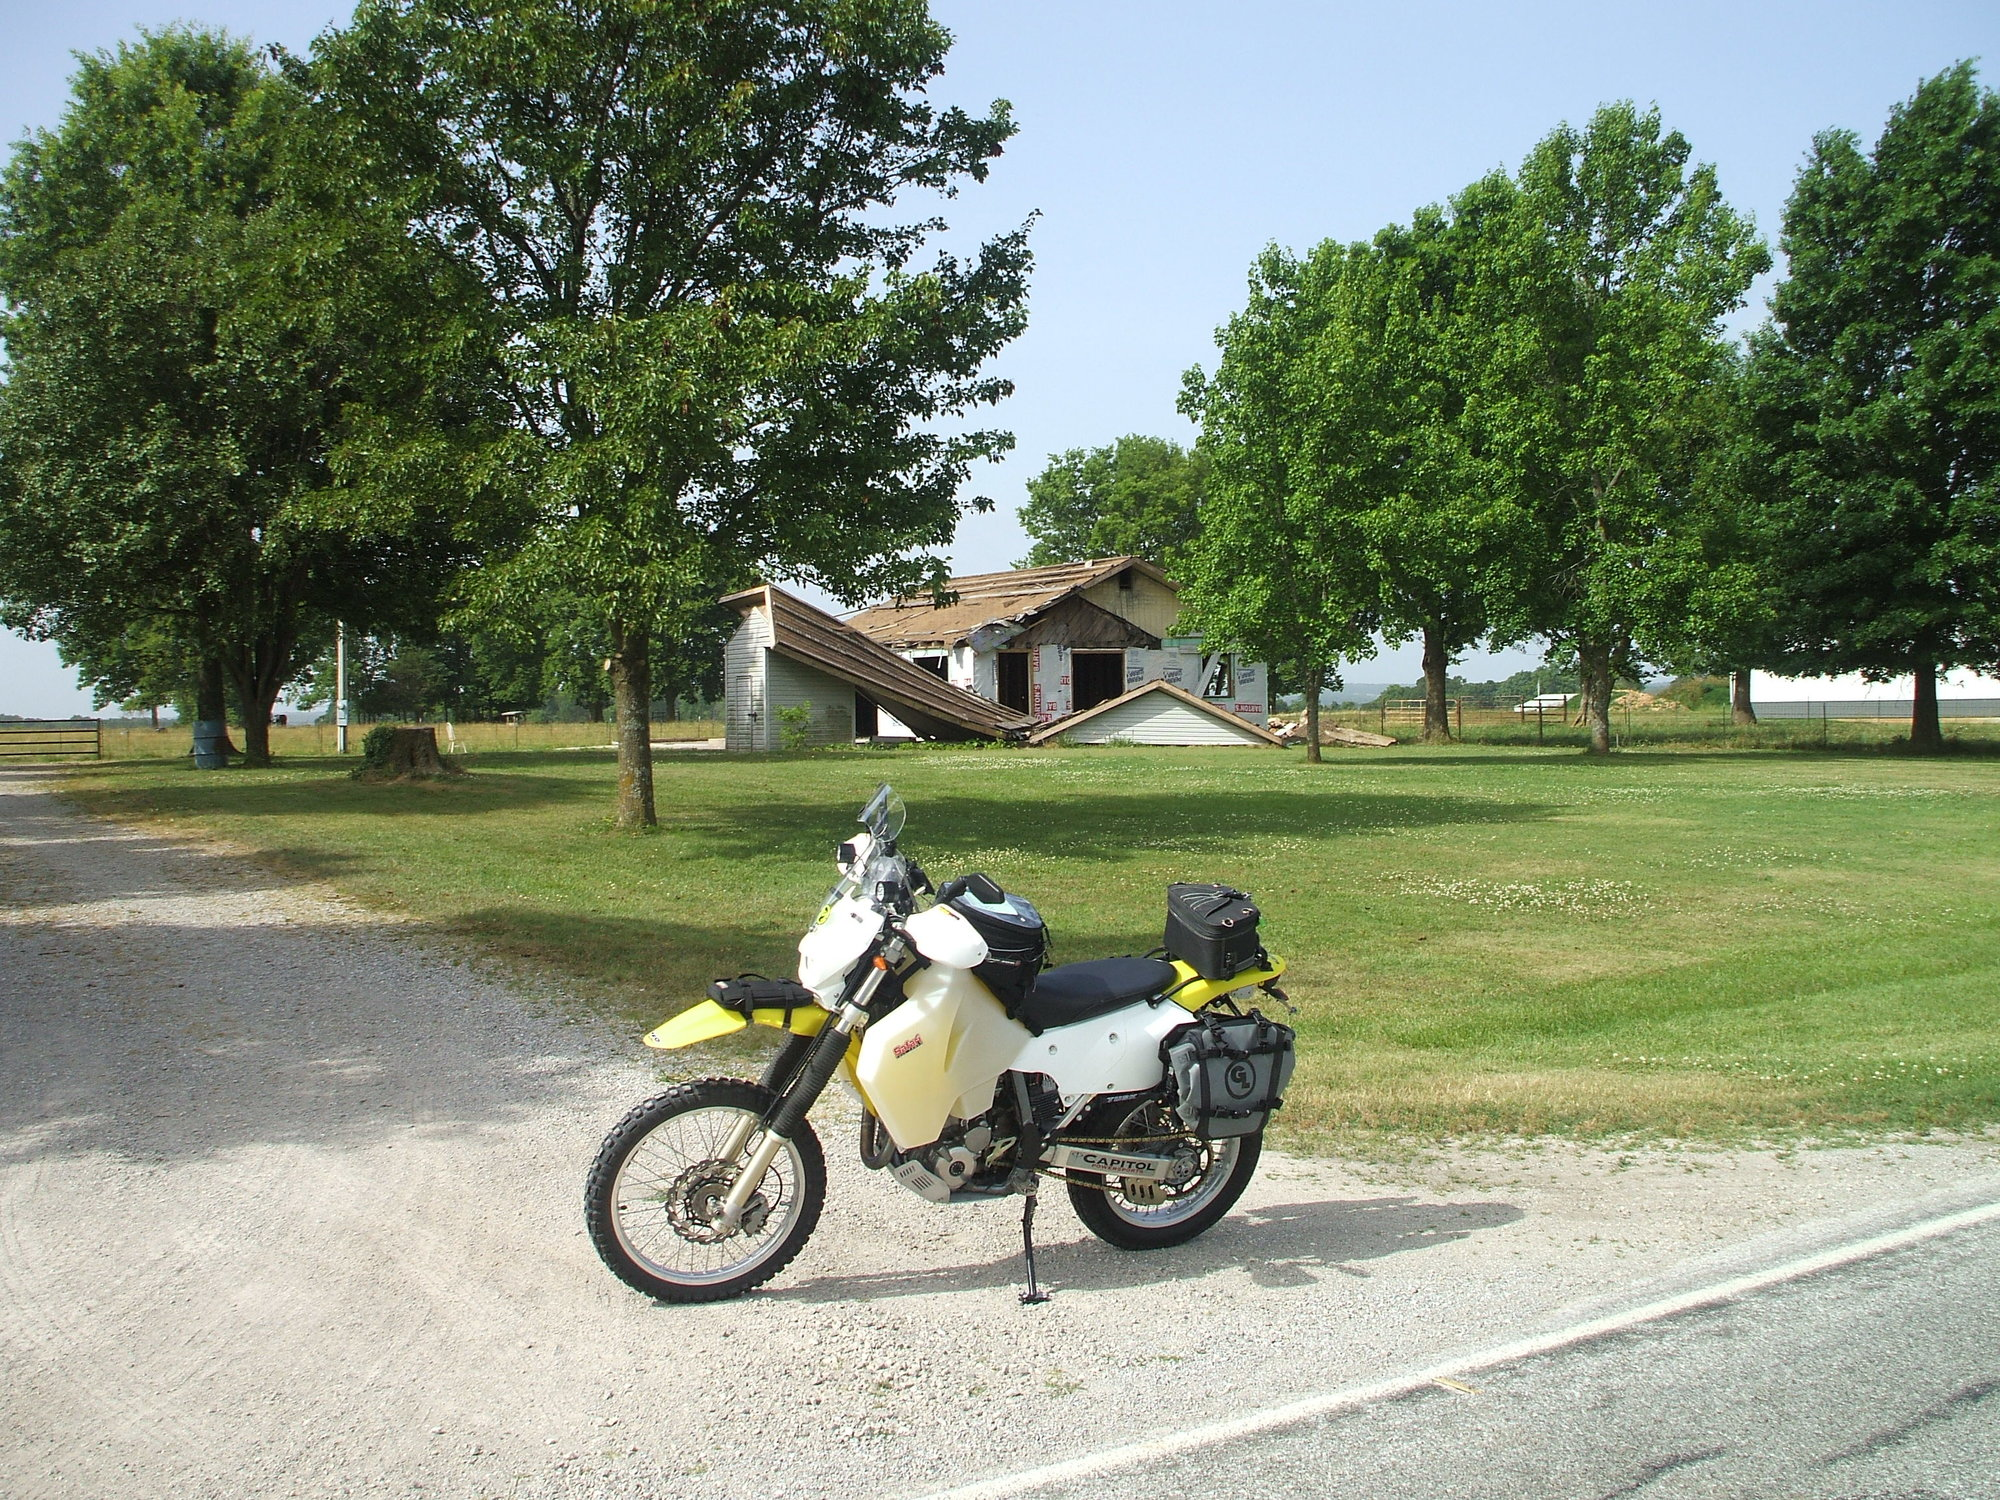 Abandoned House #2 Lawrence County Rt 66 6-28-2020.JPG